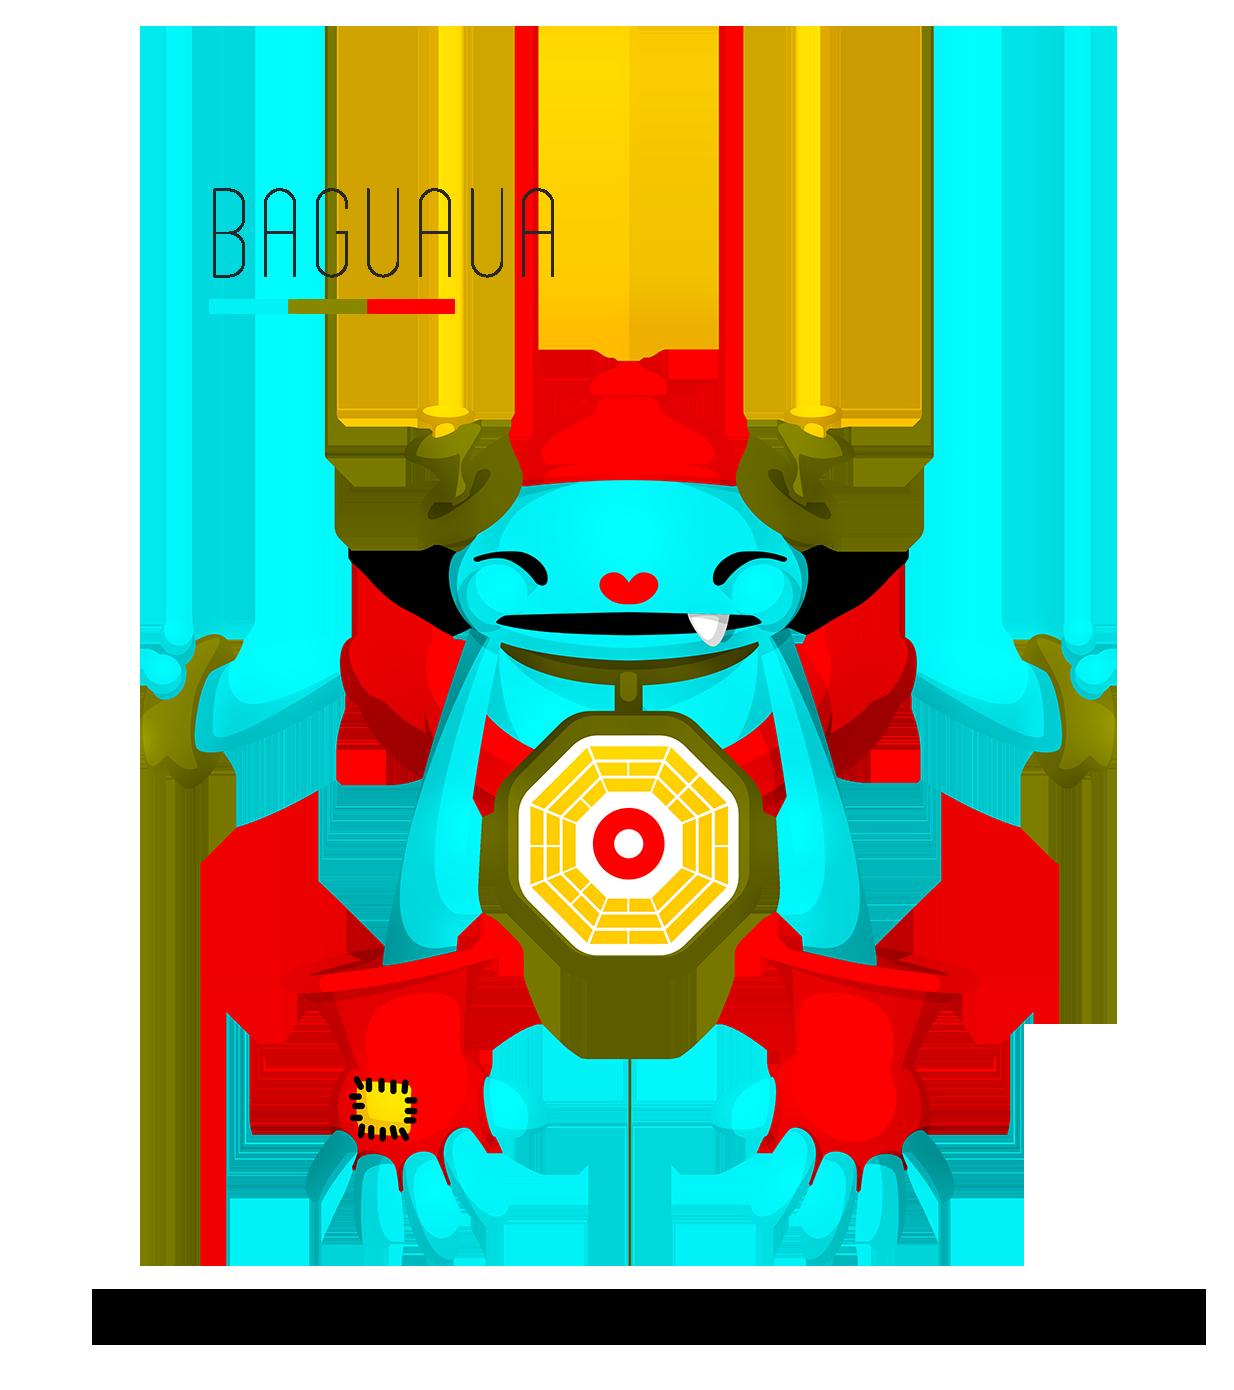 Baguaua